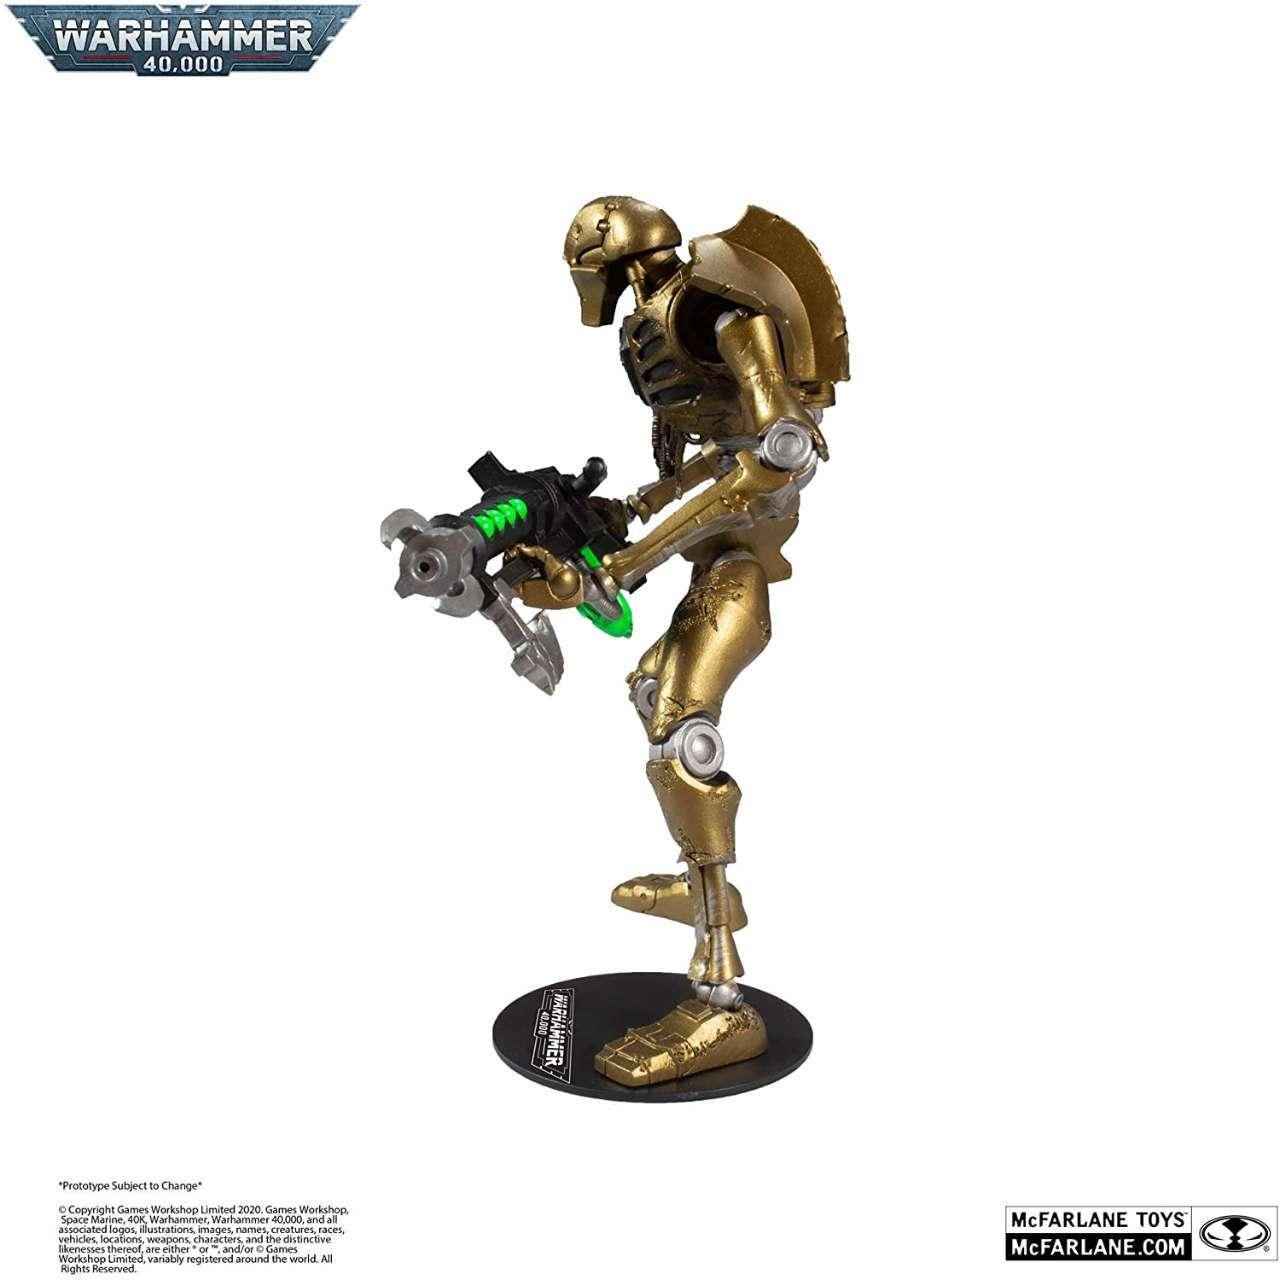 mcfarlane-warhammer-40000713JjxfIOdL_AC_SL1500_